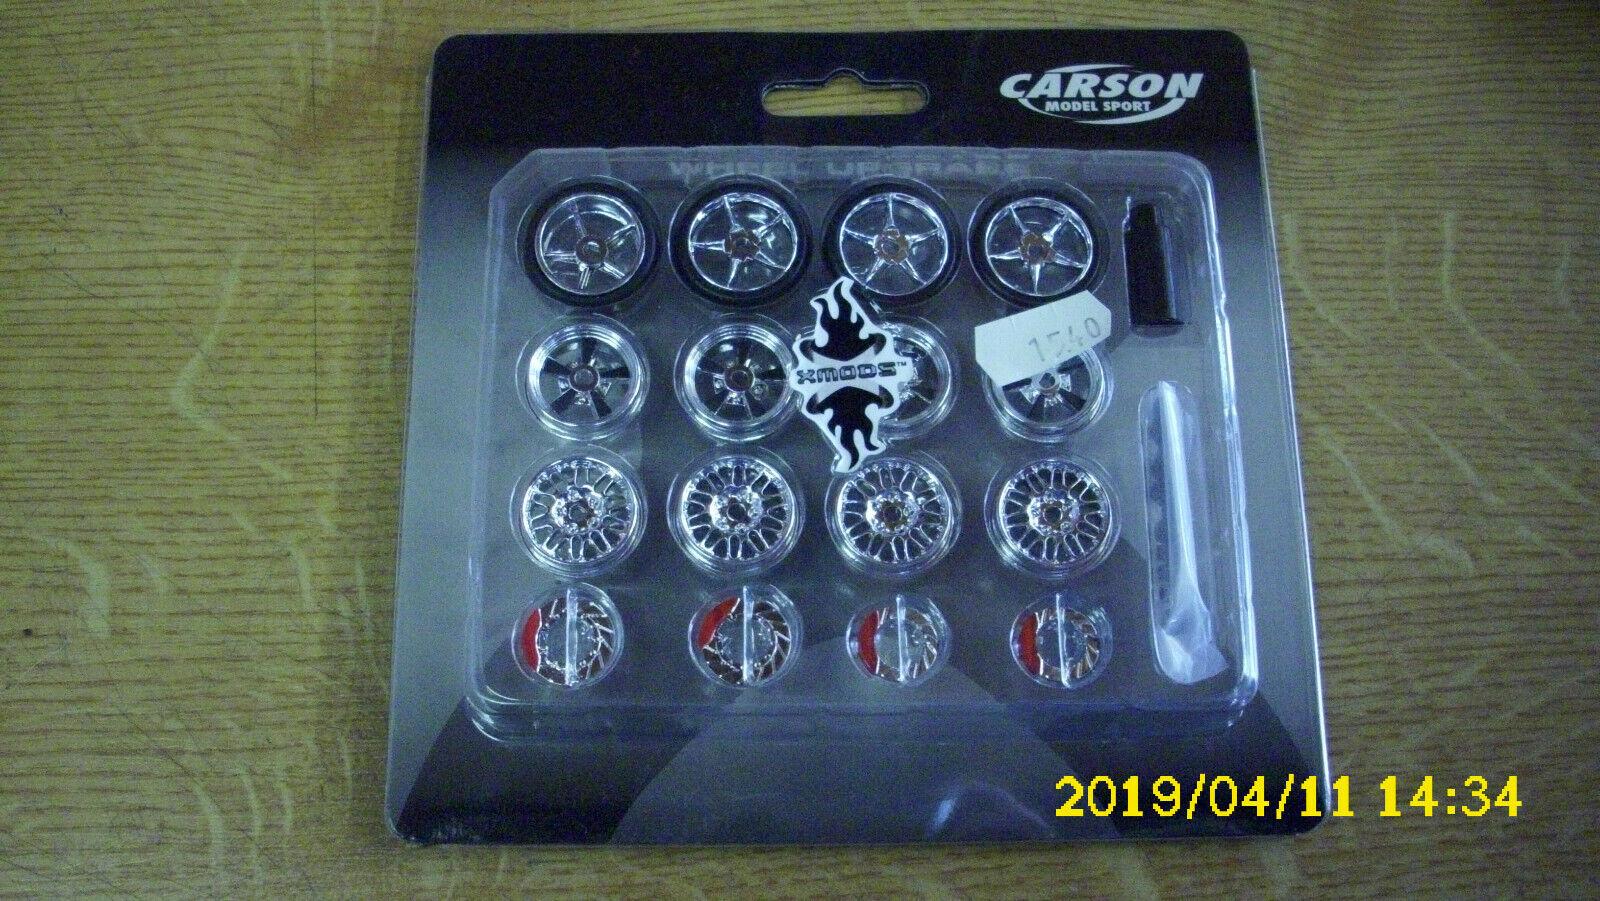 Stahl 1Armig Carson 500907162-1:14 Reserveradhalter Neu